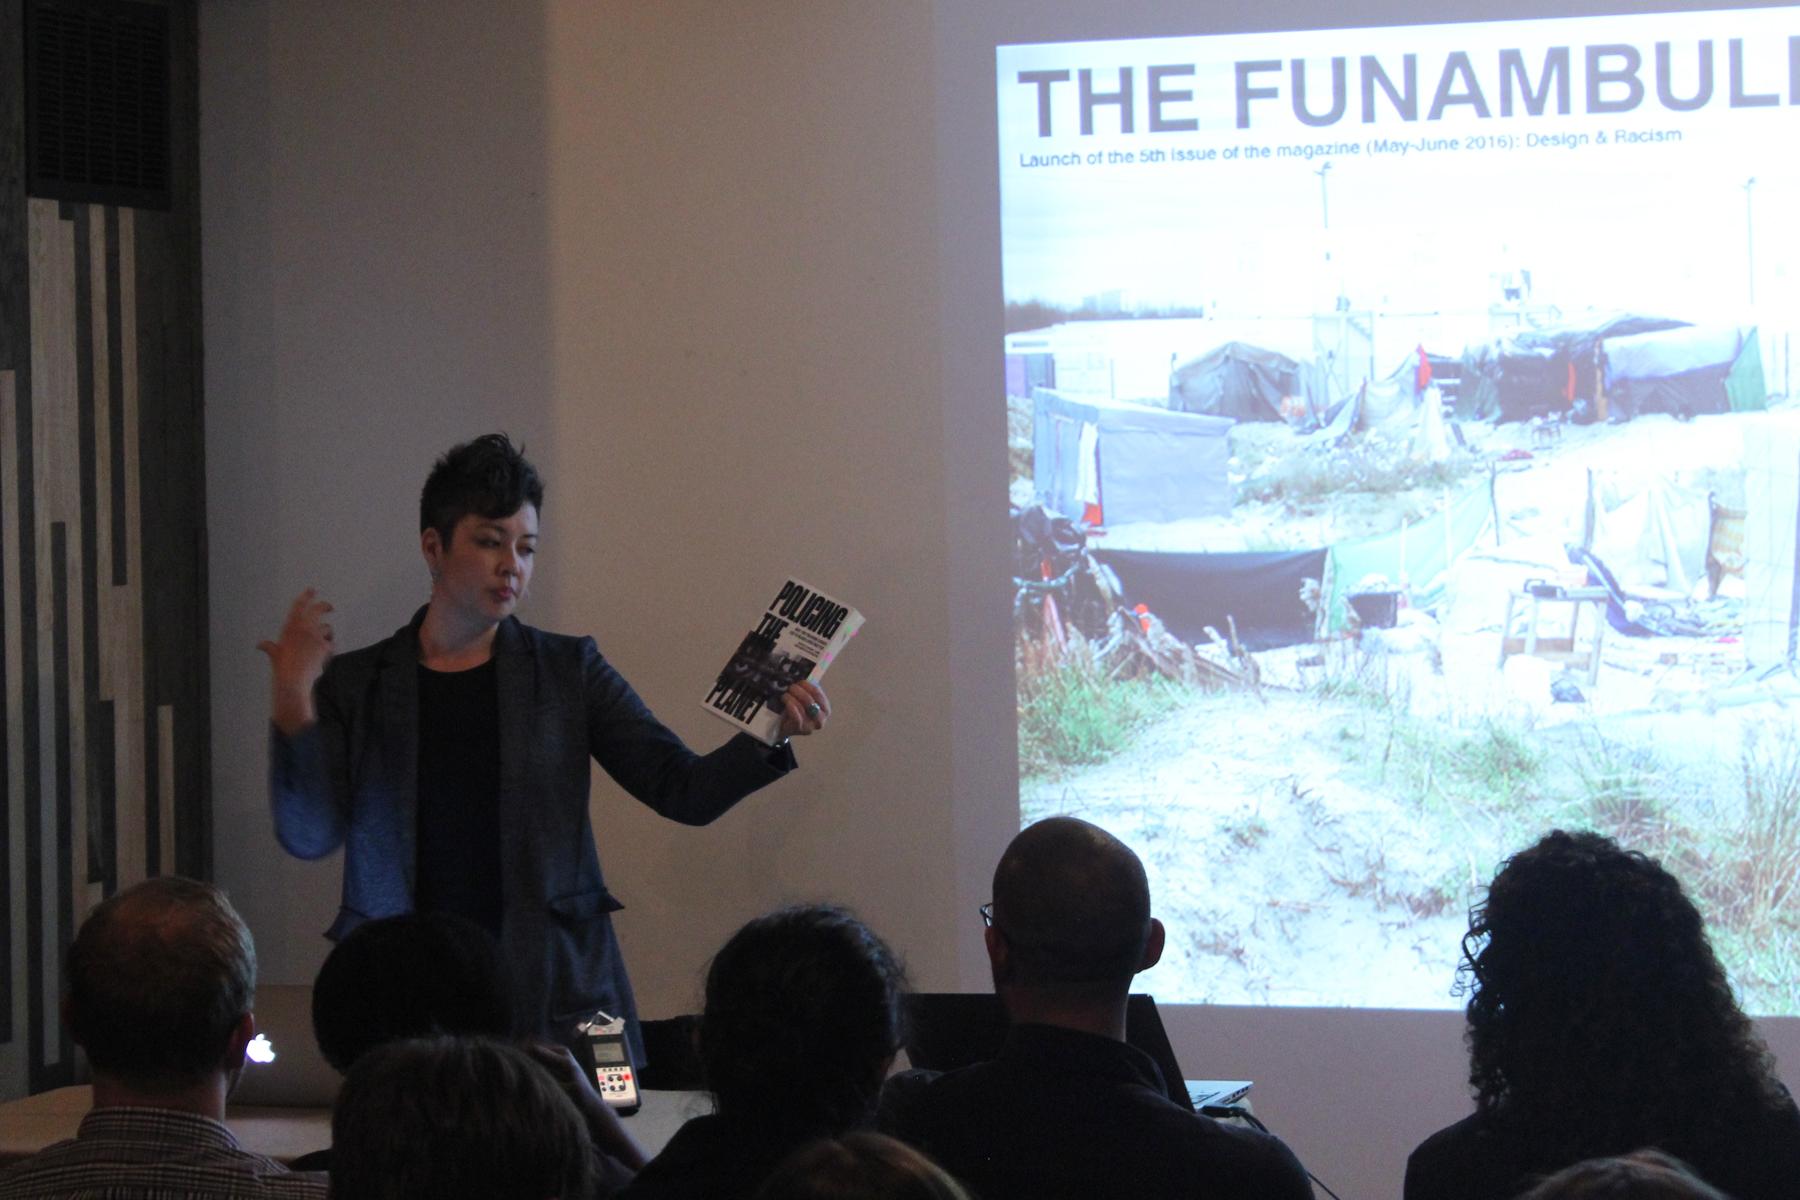 The Funambulist 5 NY Launch 04